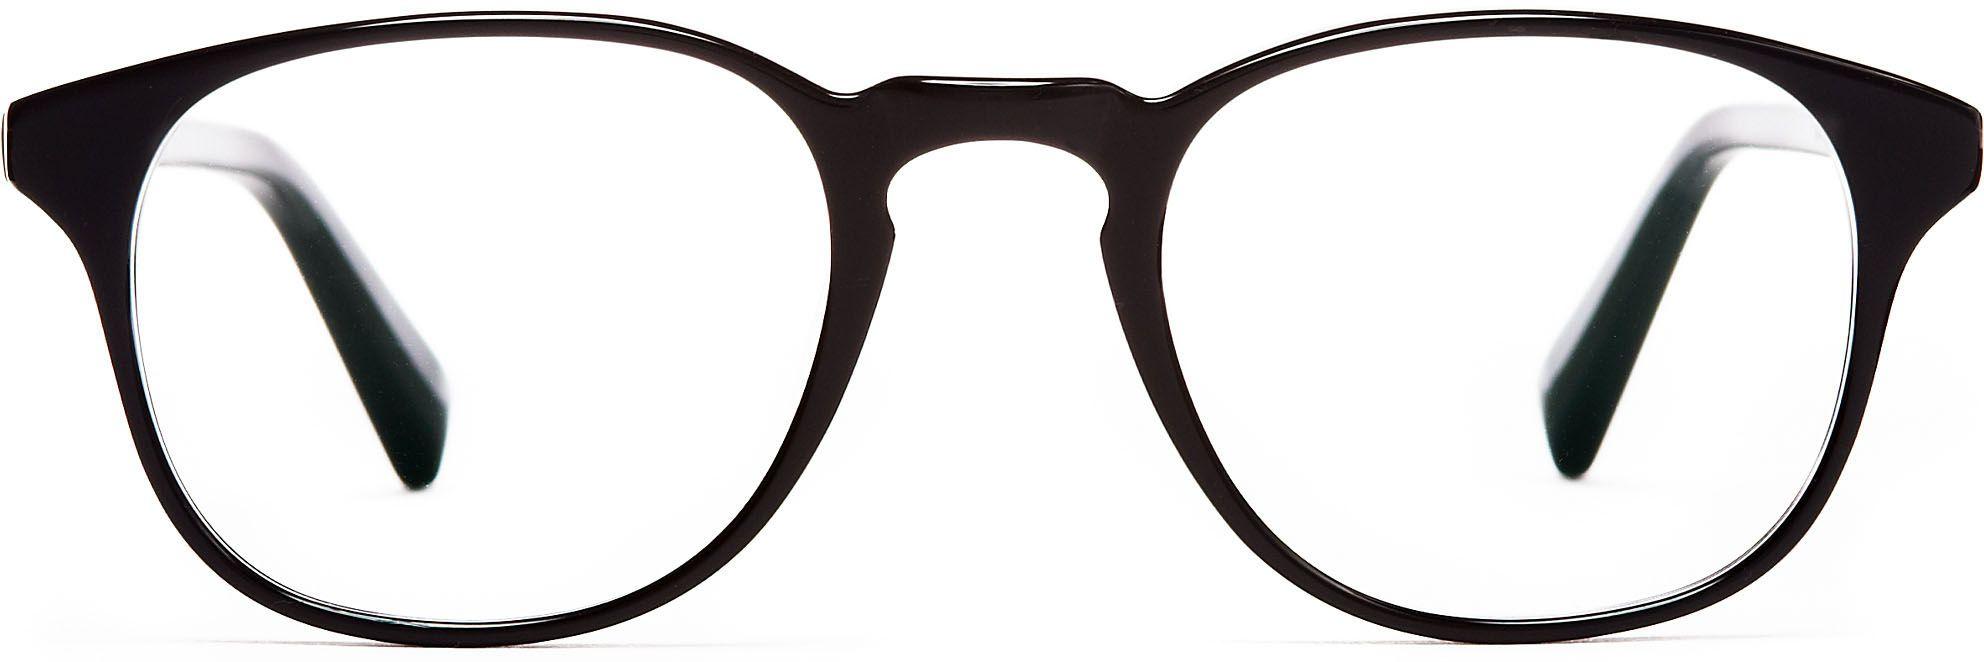 Downing Eyeglasses in Jet Black for Women | Warby Parker